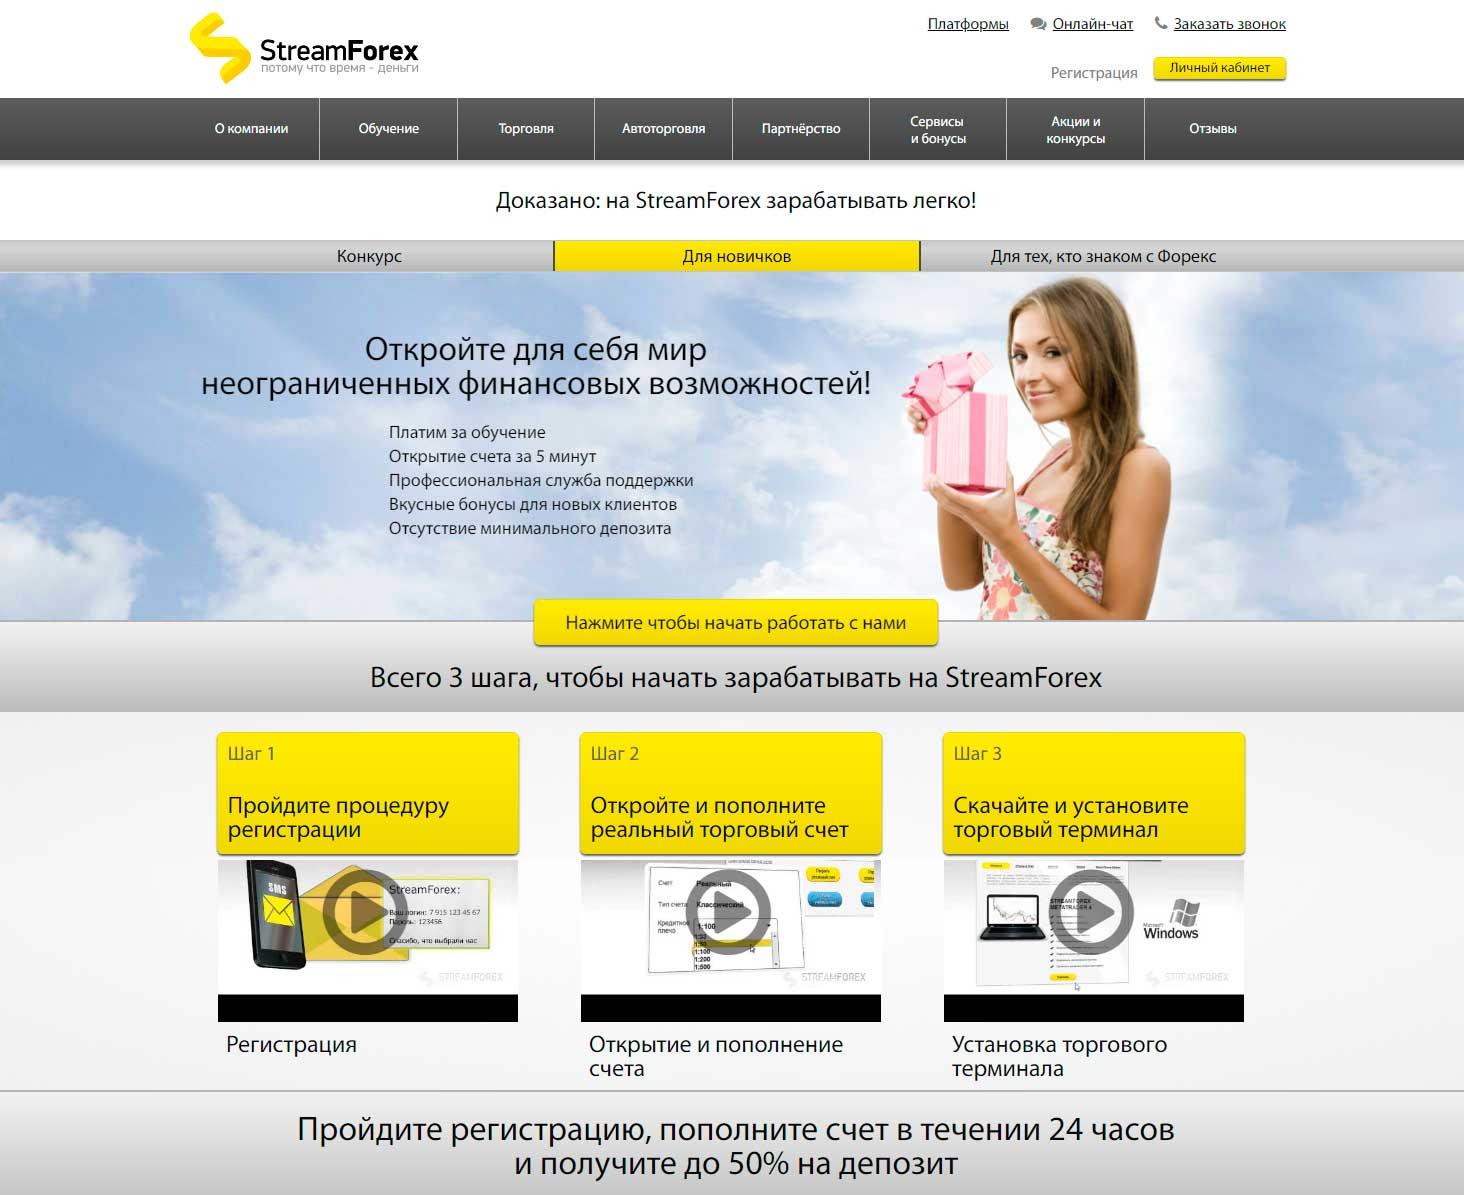 streamforex отзывы